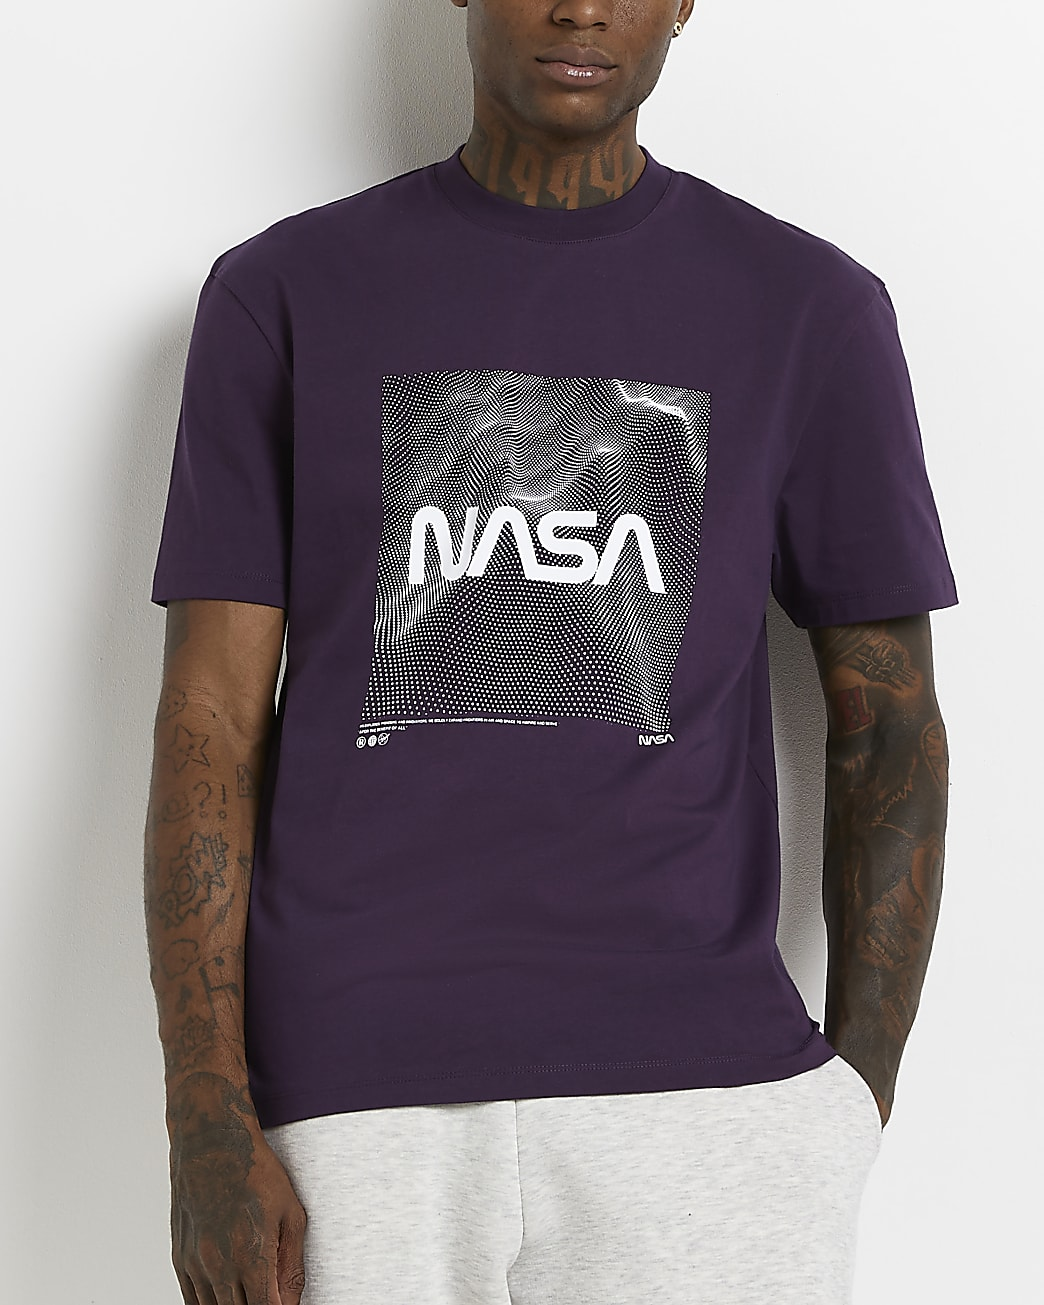 Purple regular fit NASA graphic t-shirt